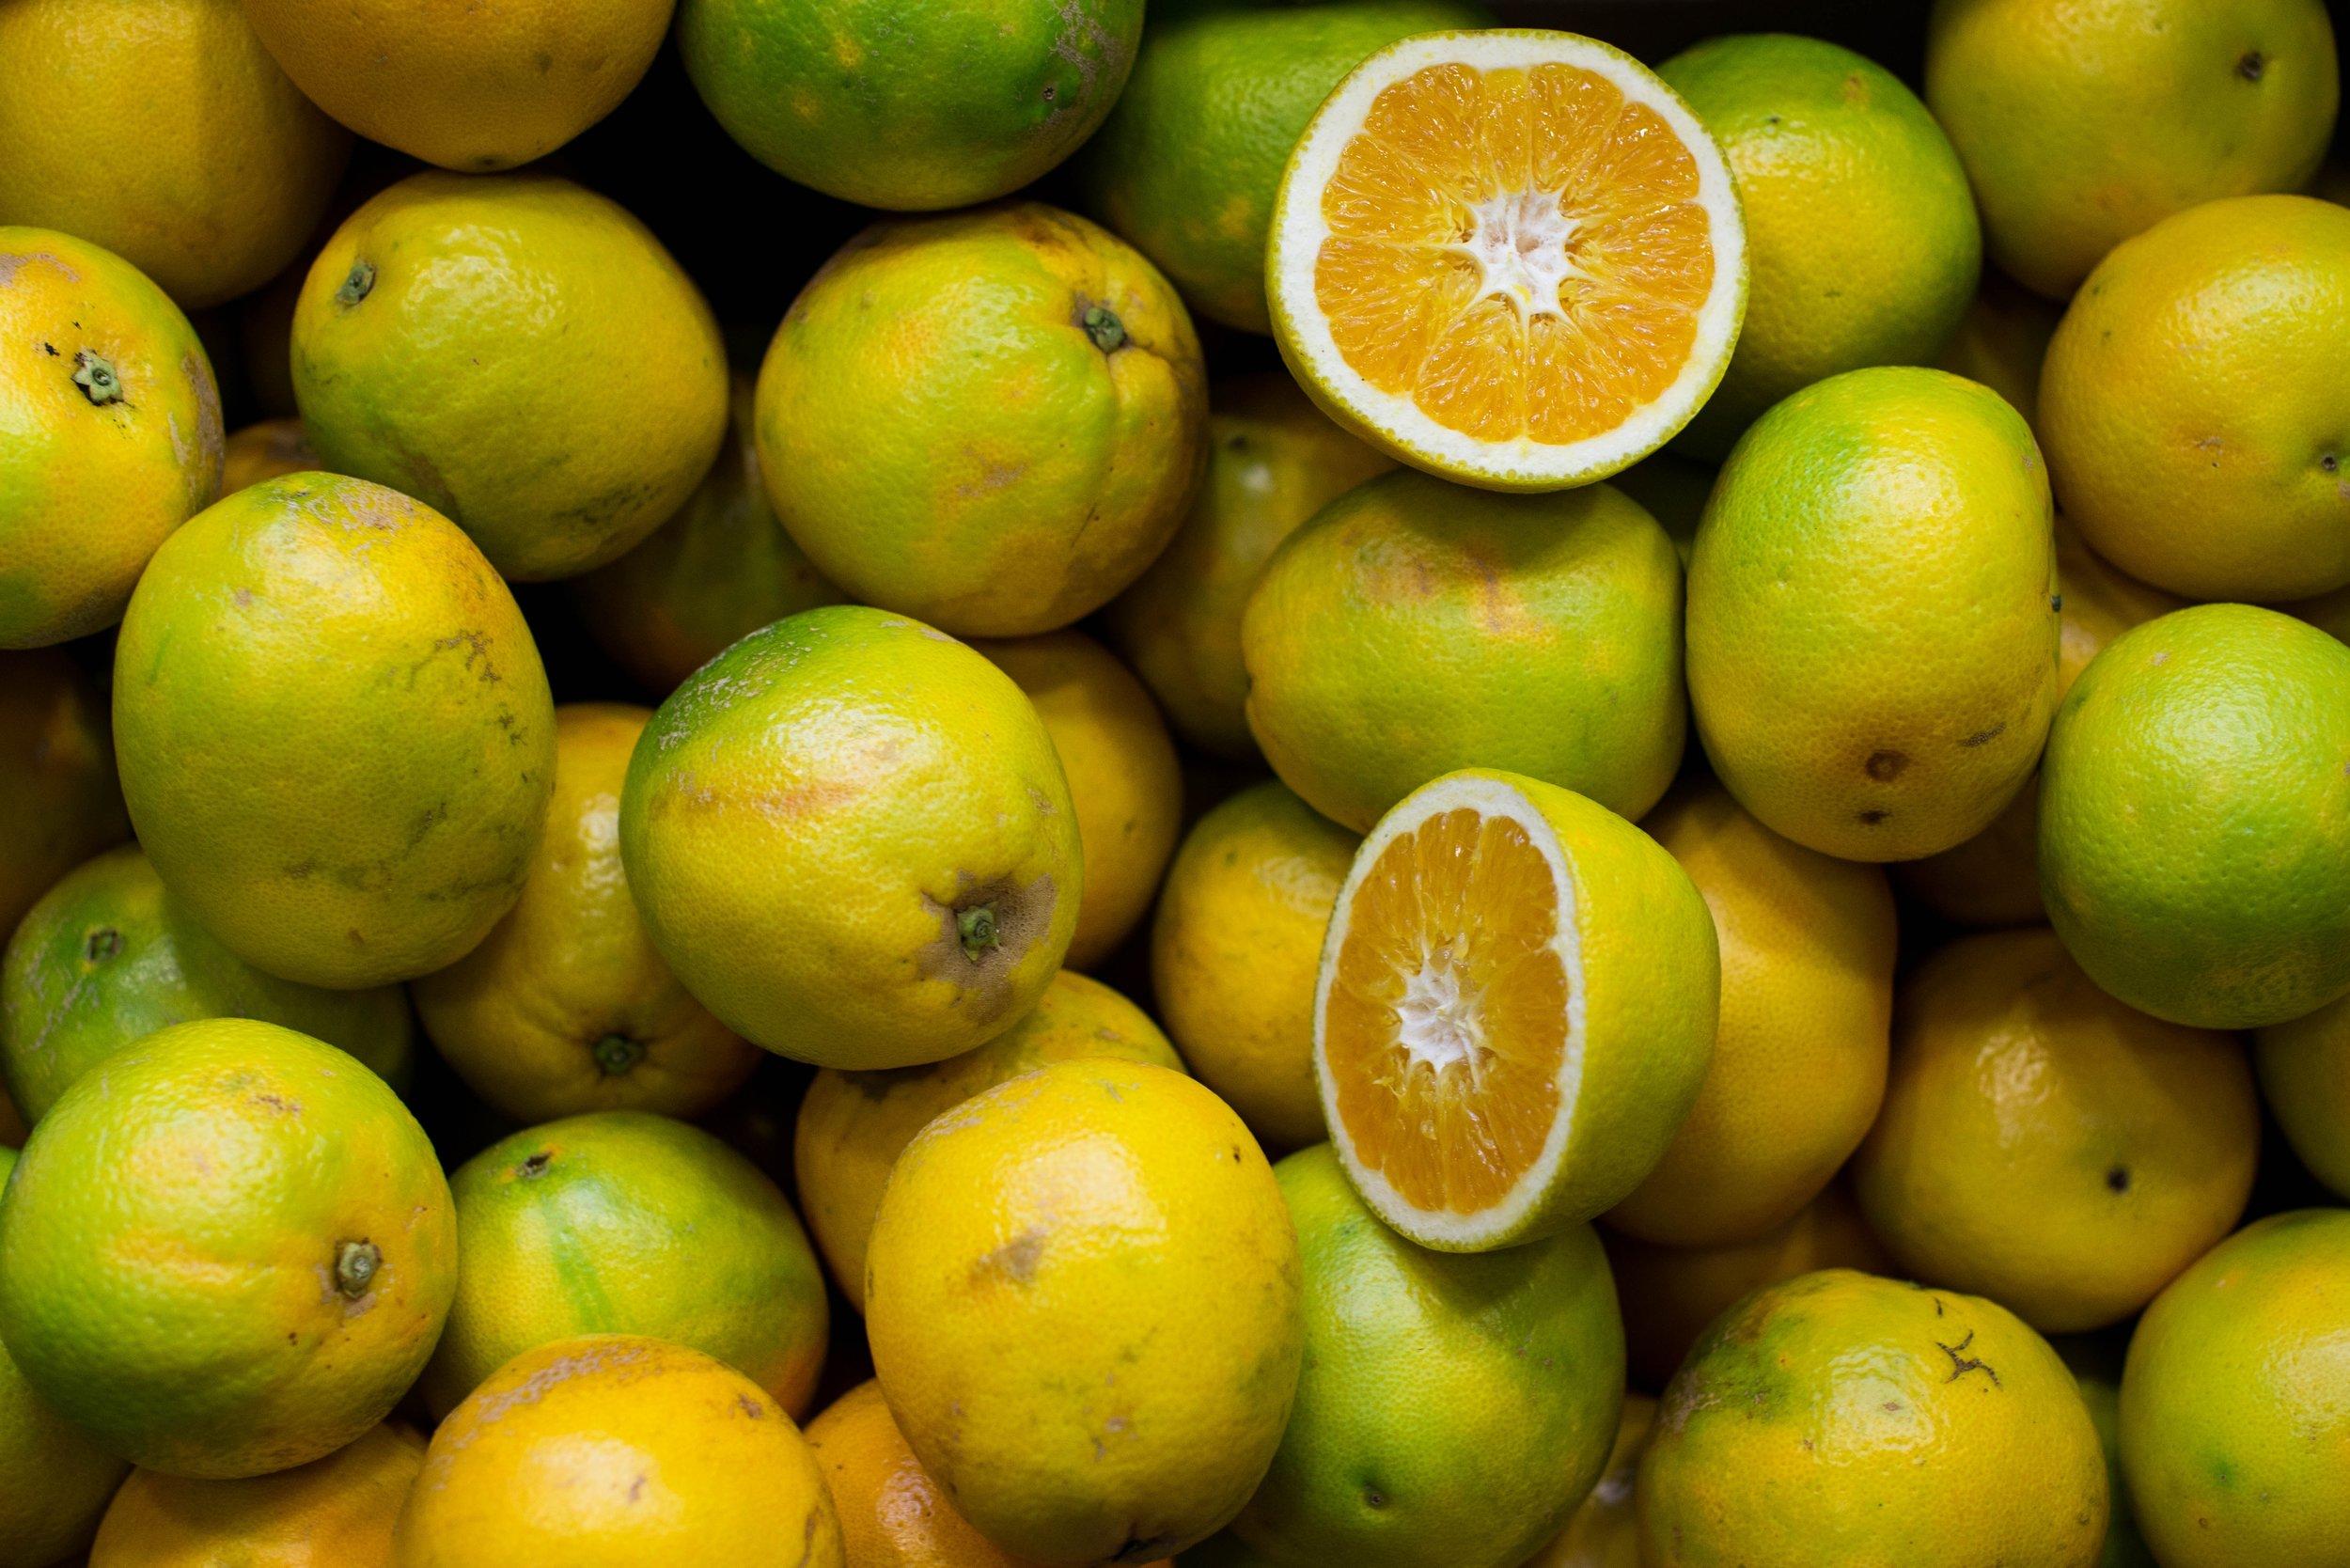 bloom_candyfloss_lemons_organic_gallery_picture_number_3.jpg